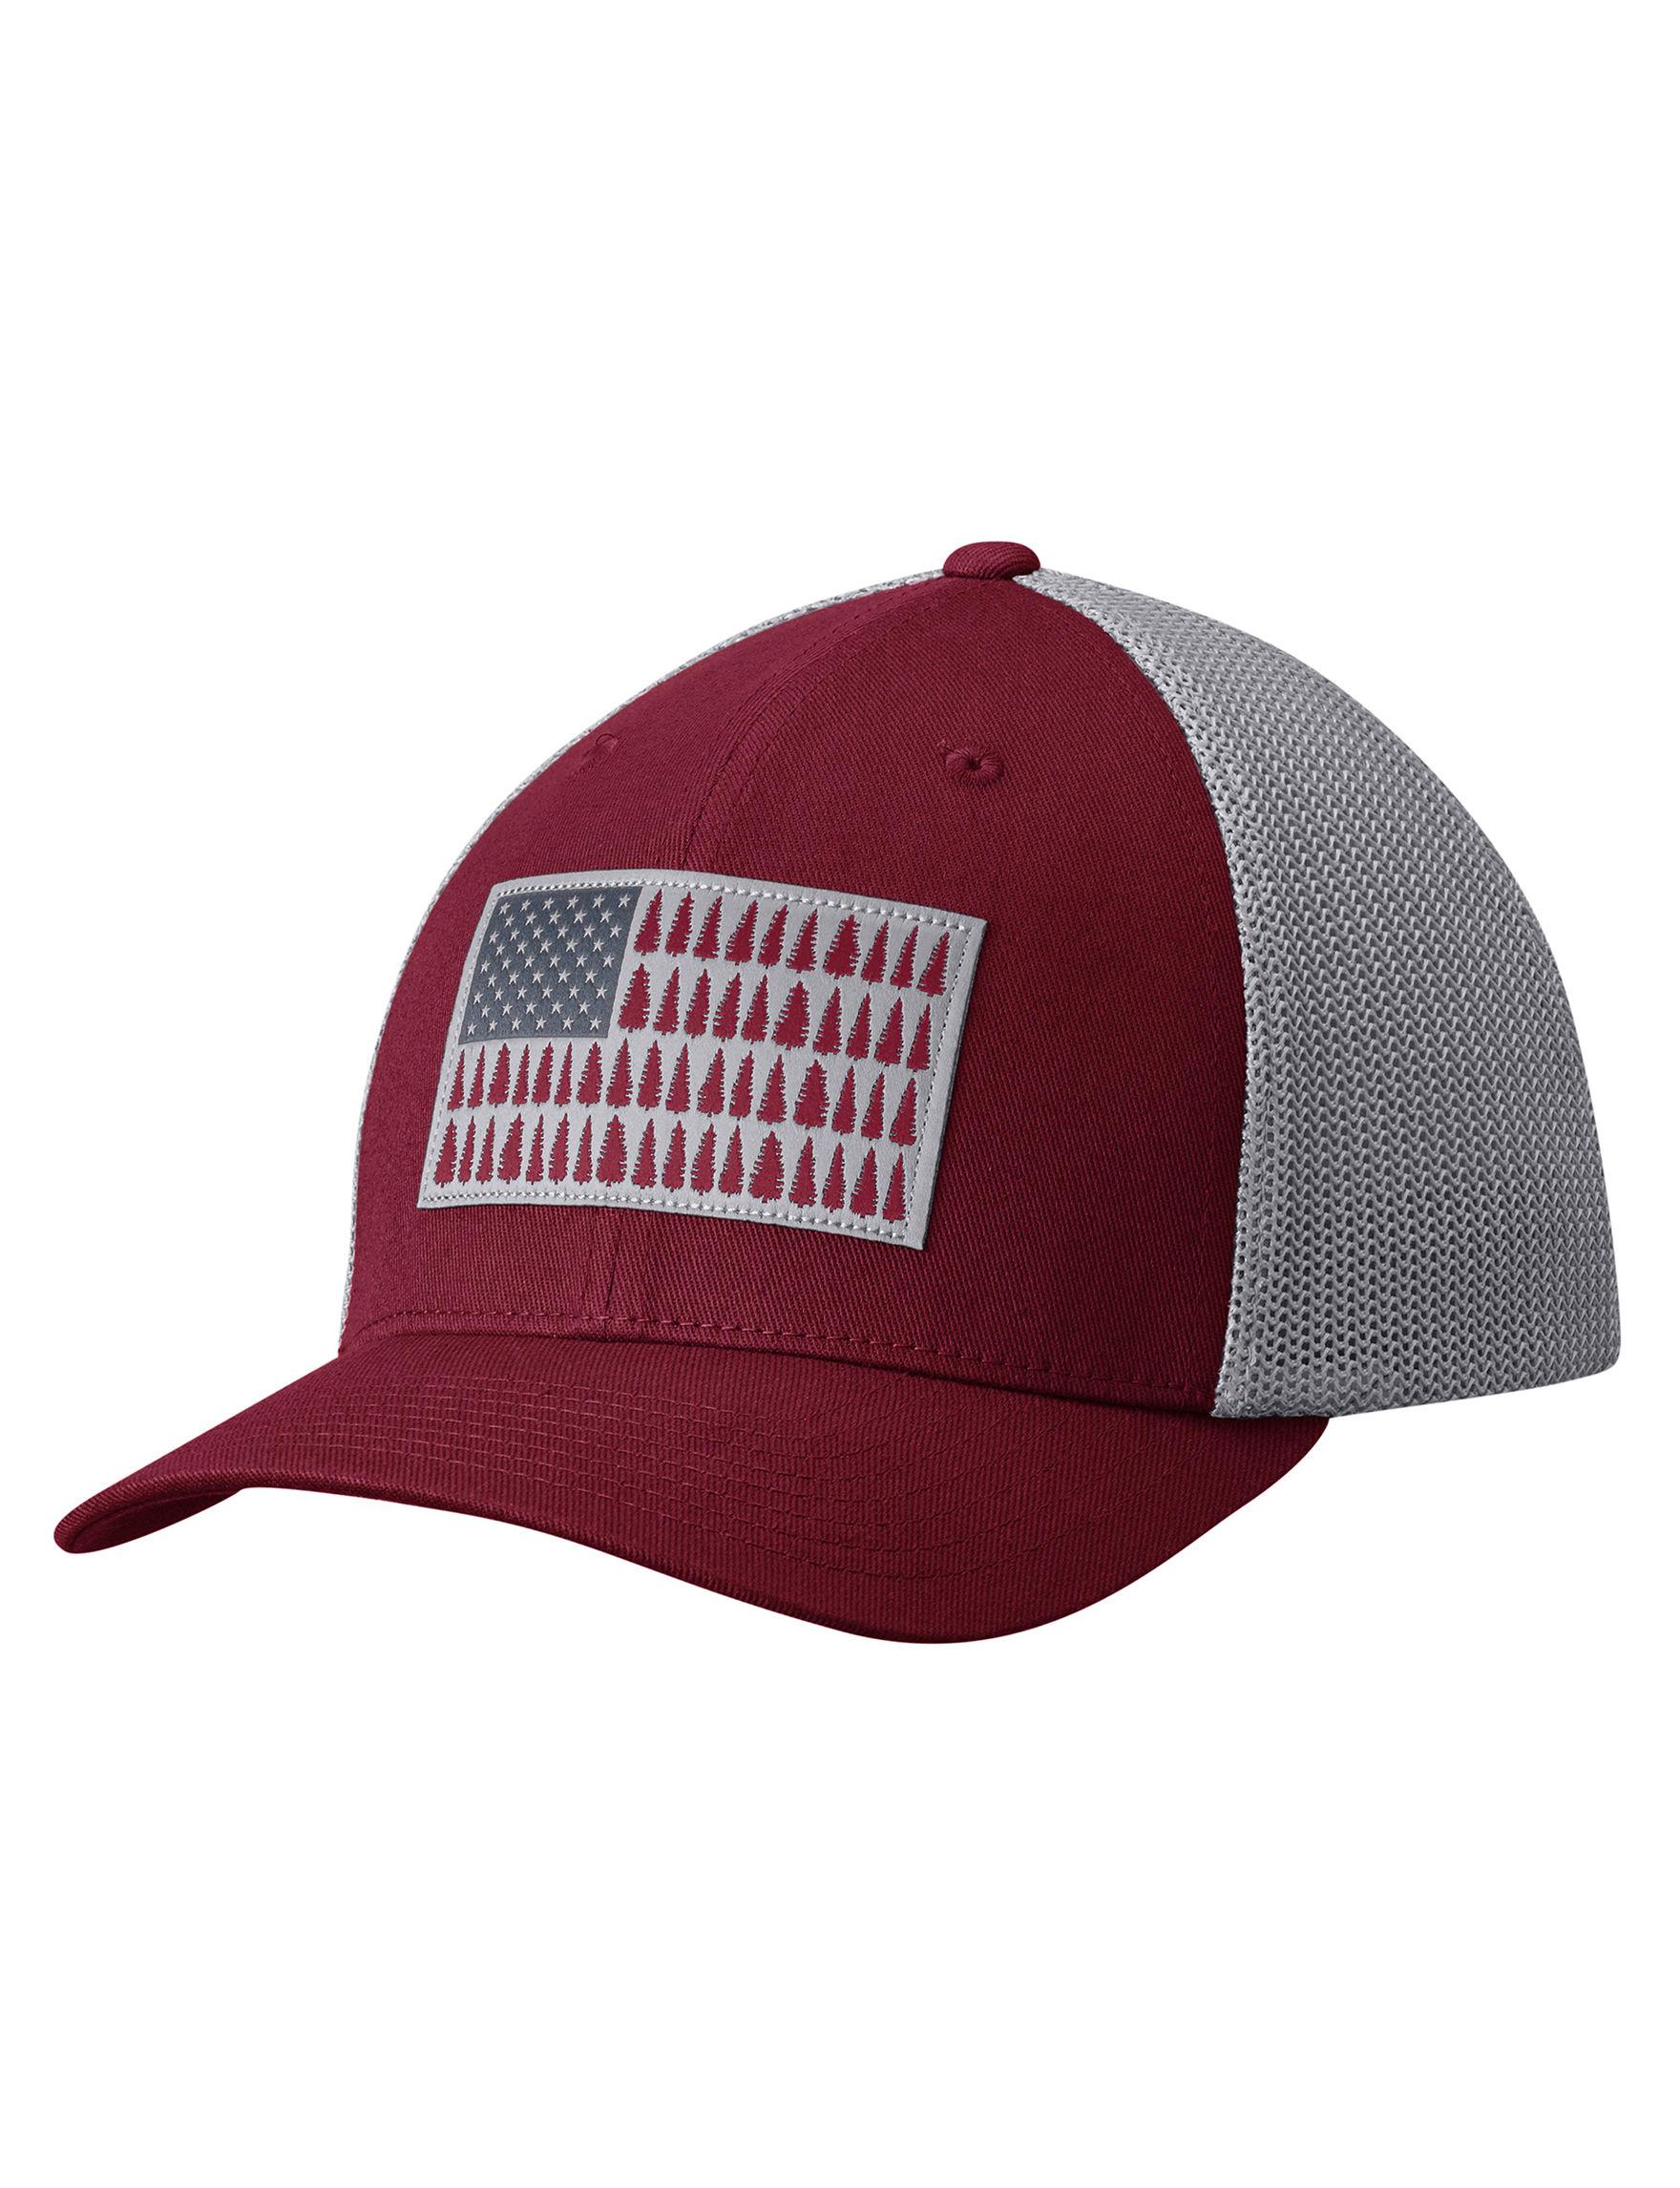 Columbia Burgundy Hats & Headwear